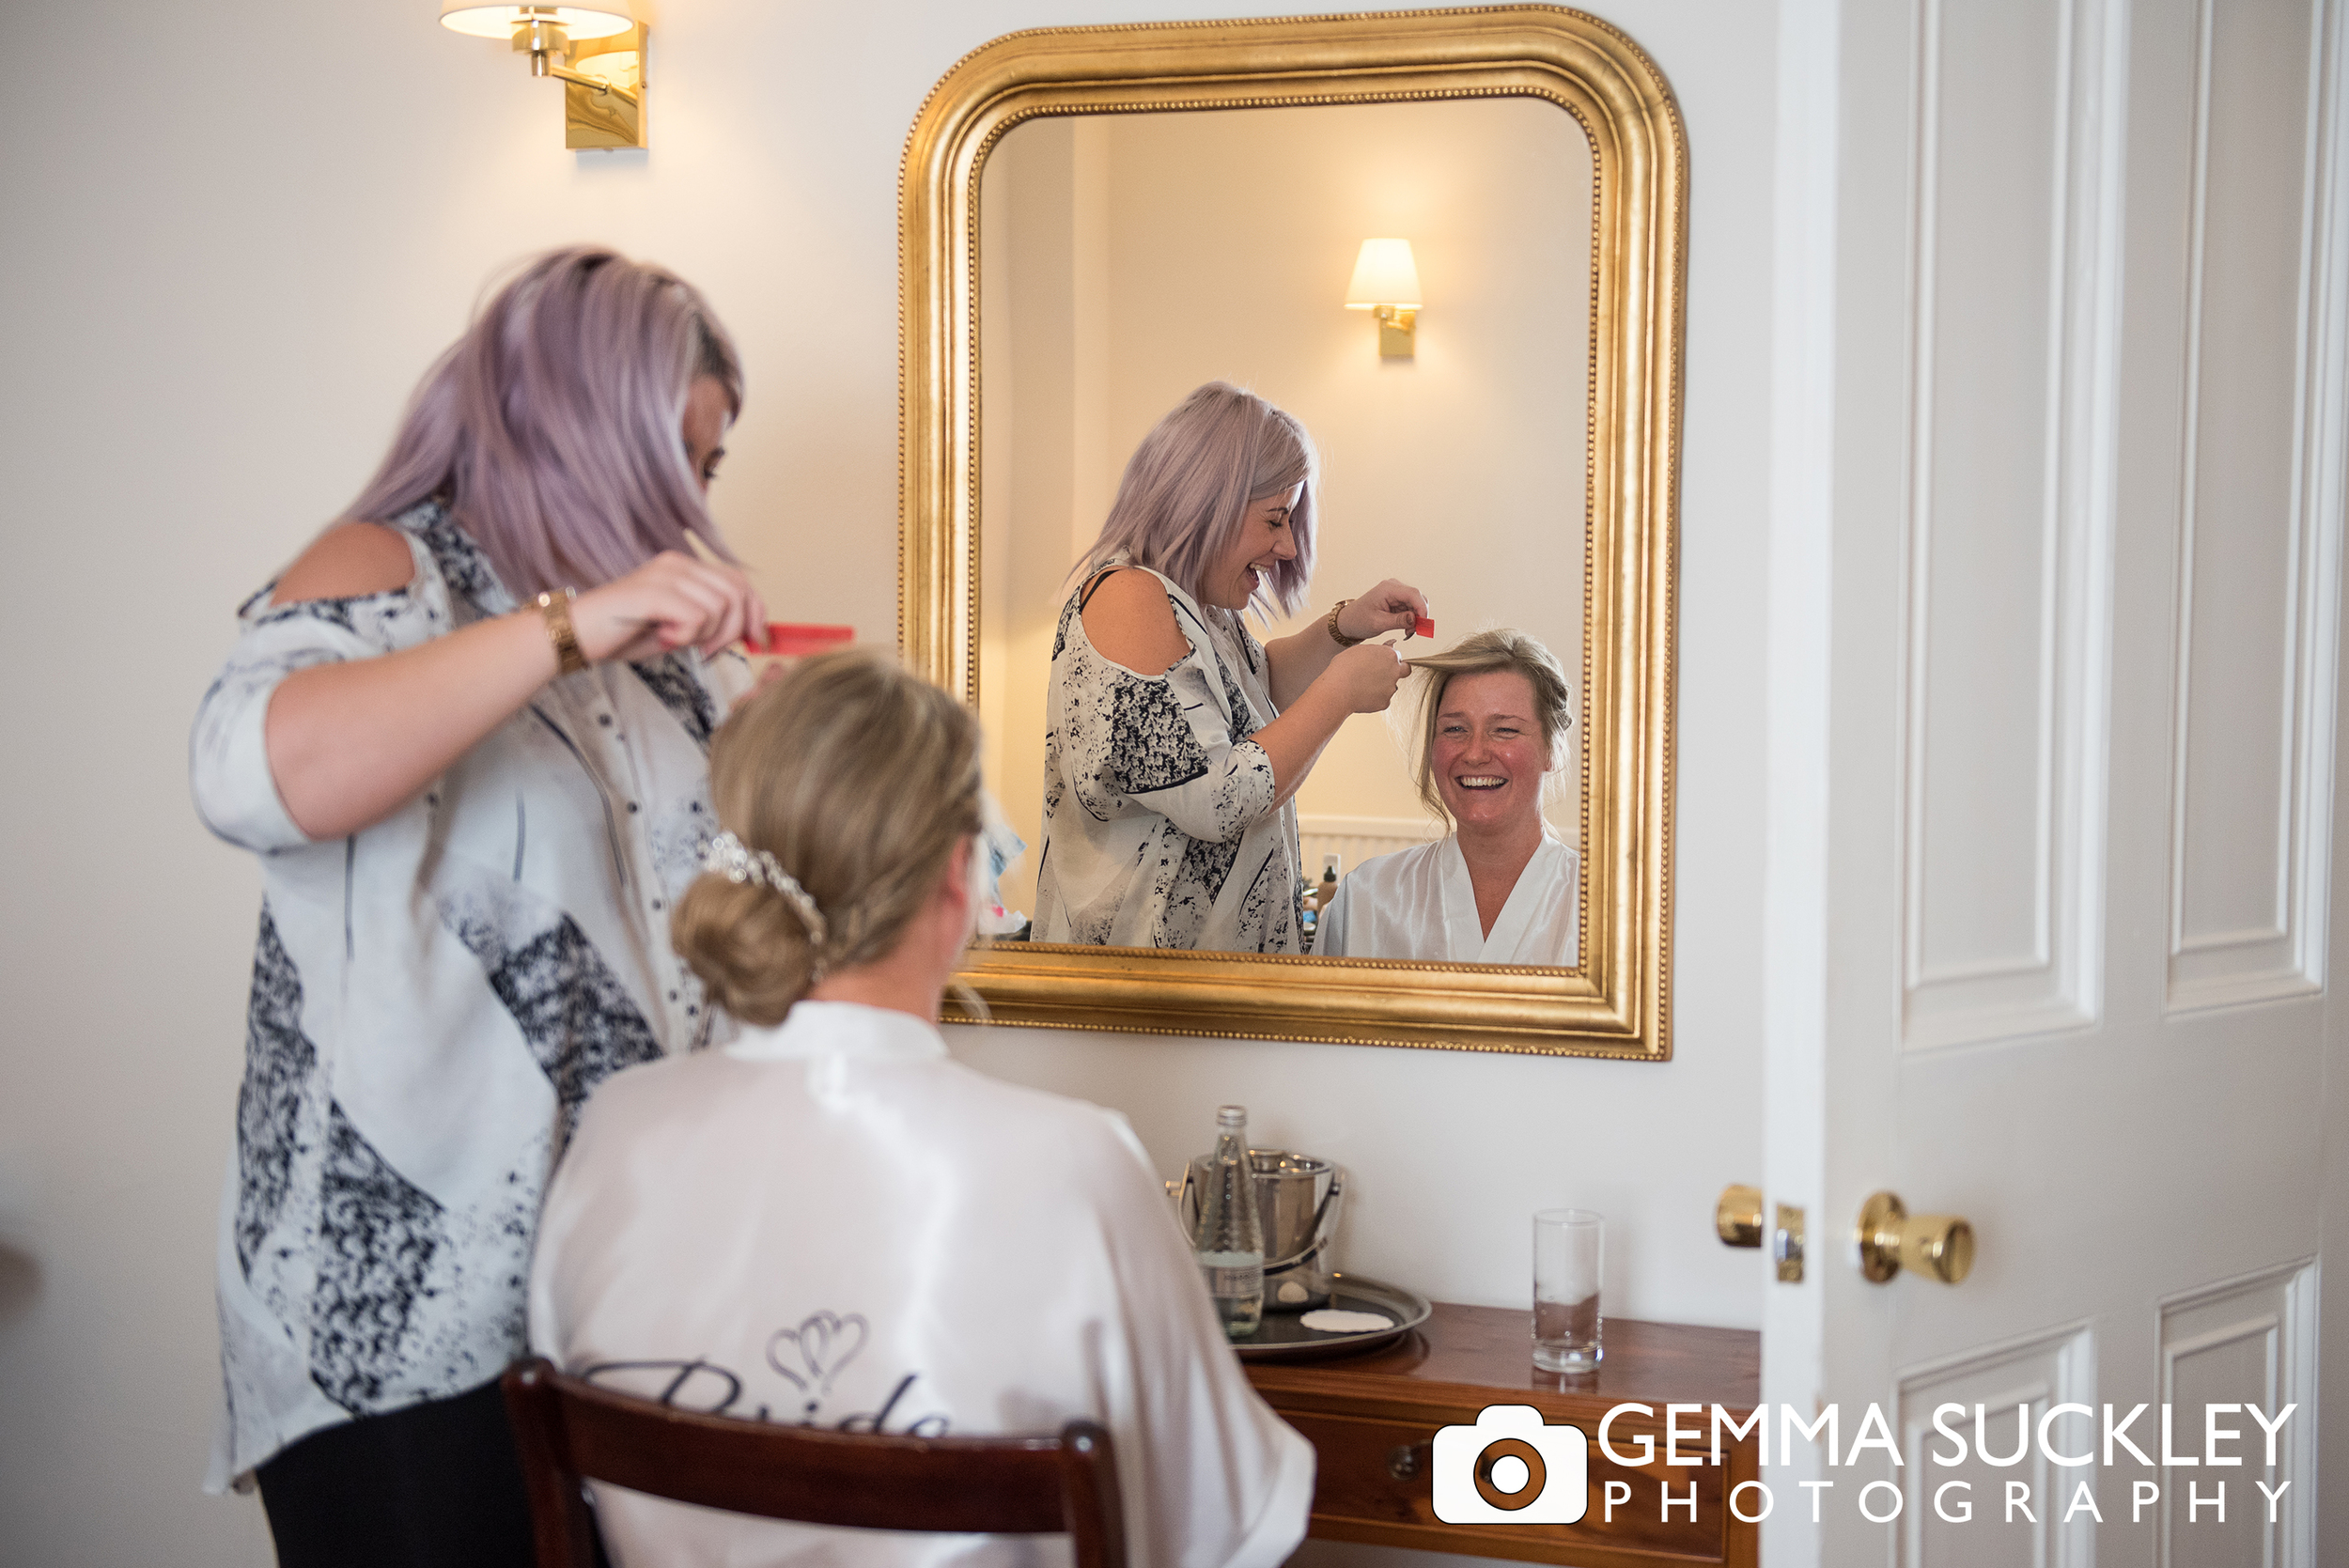 hair©gemmasuckleyphotography.jpg